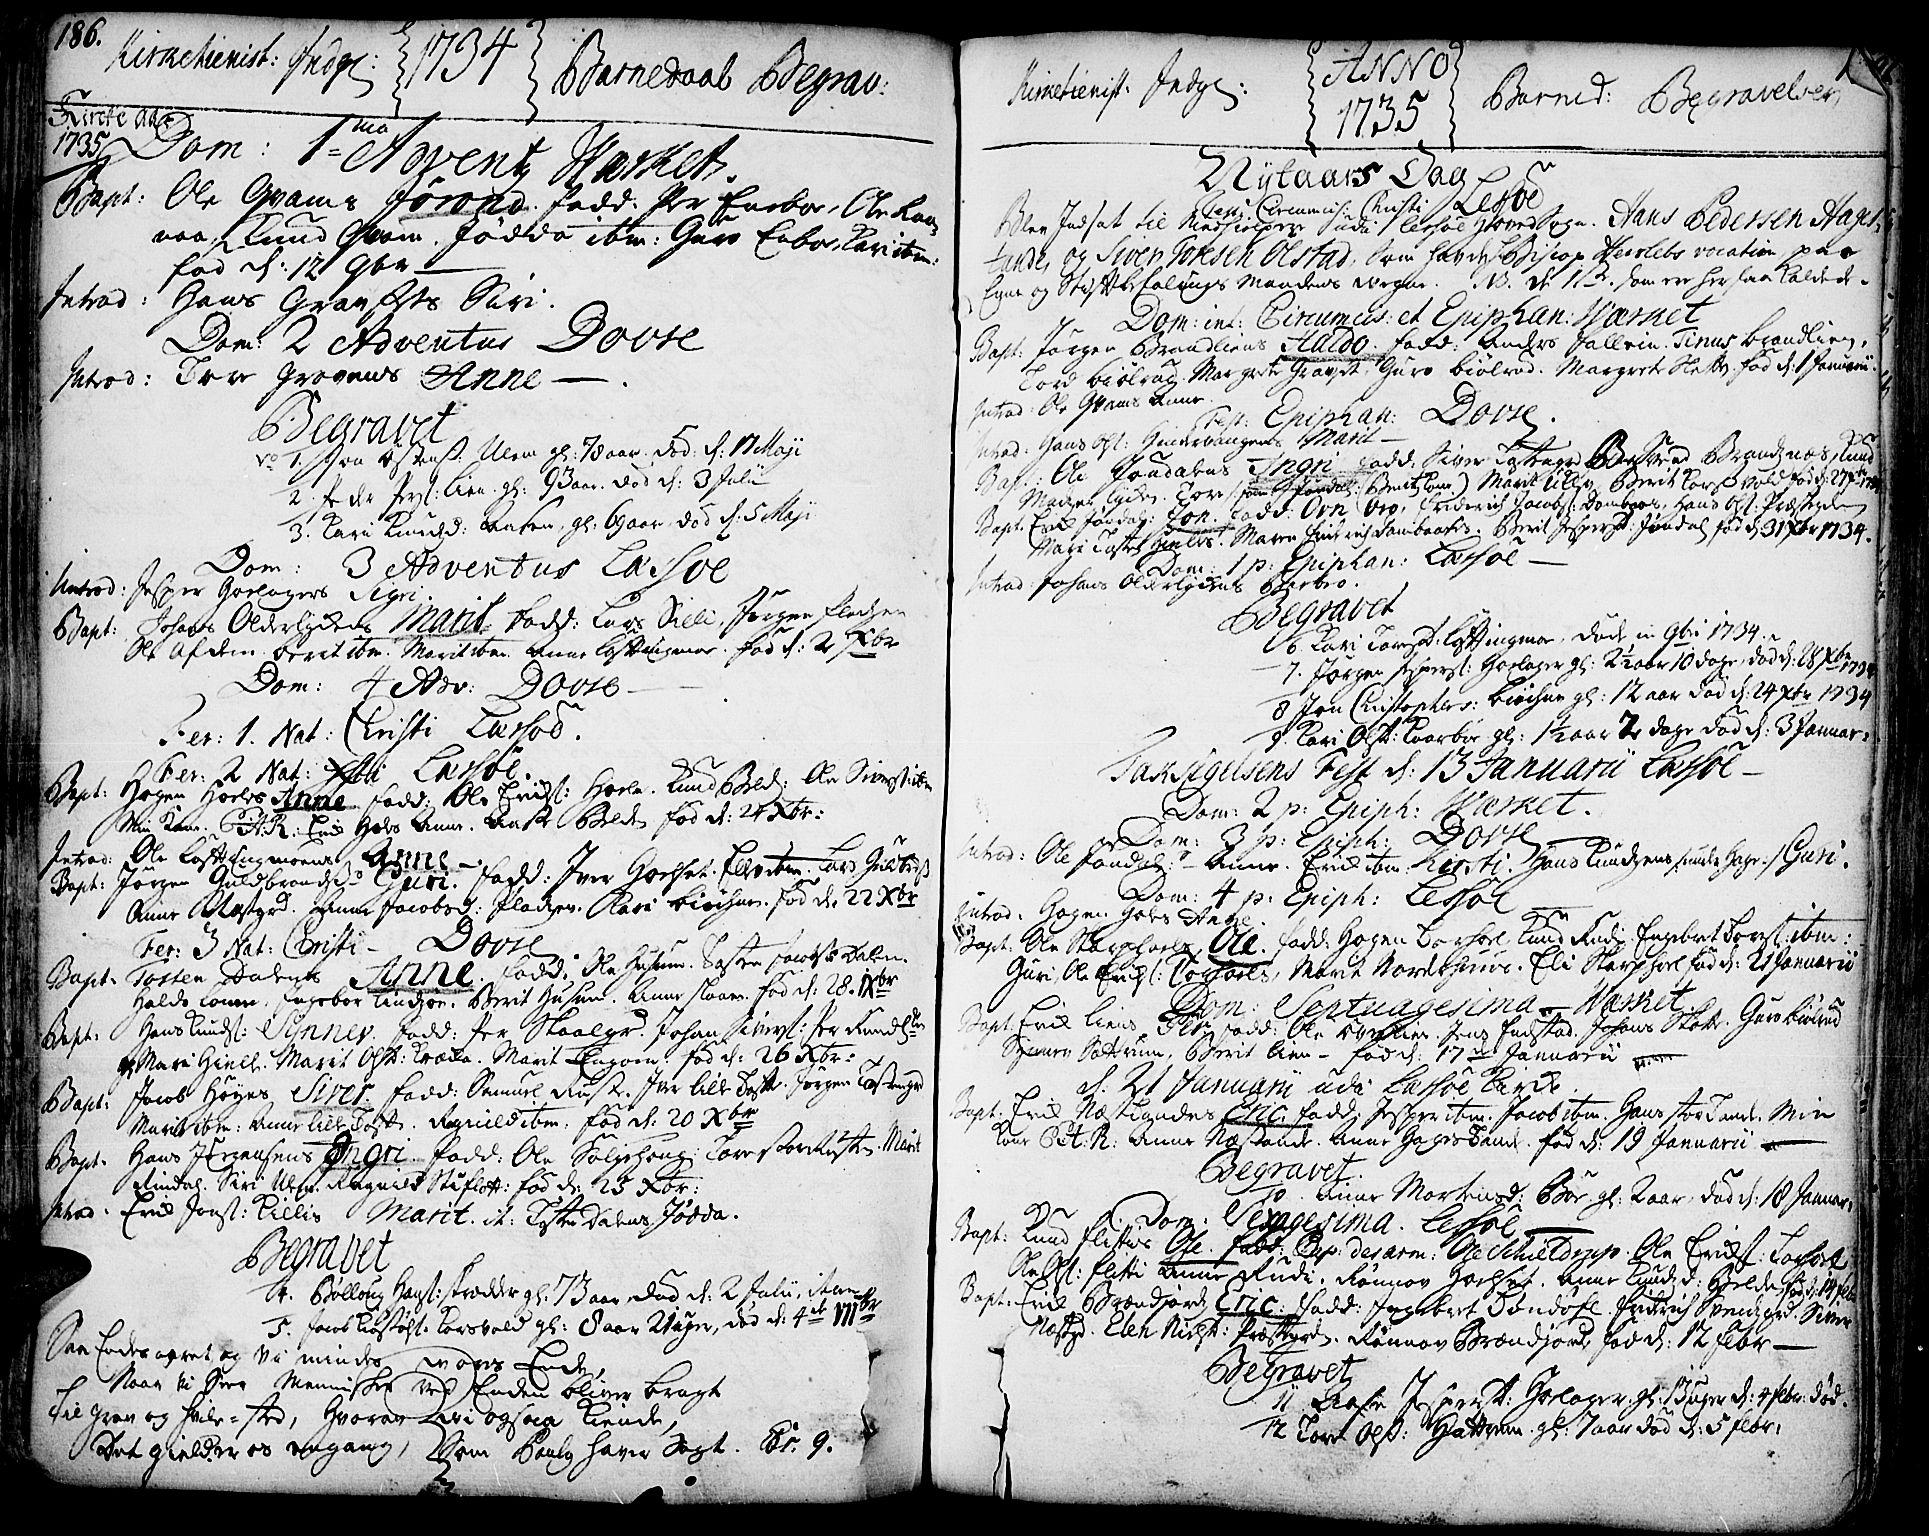 SAH, Lesja prestekontor, Ministerialbok nr. 2, 1732-1776, s. 186-187